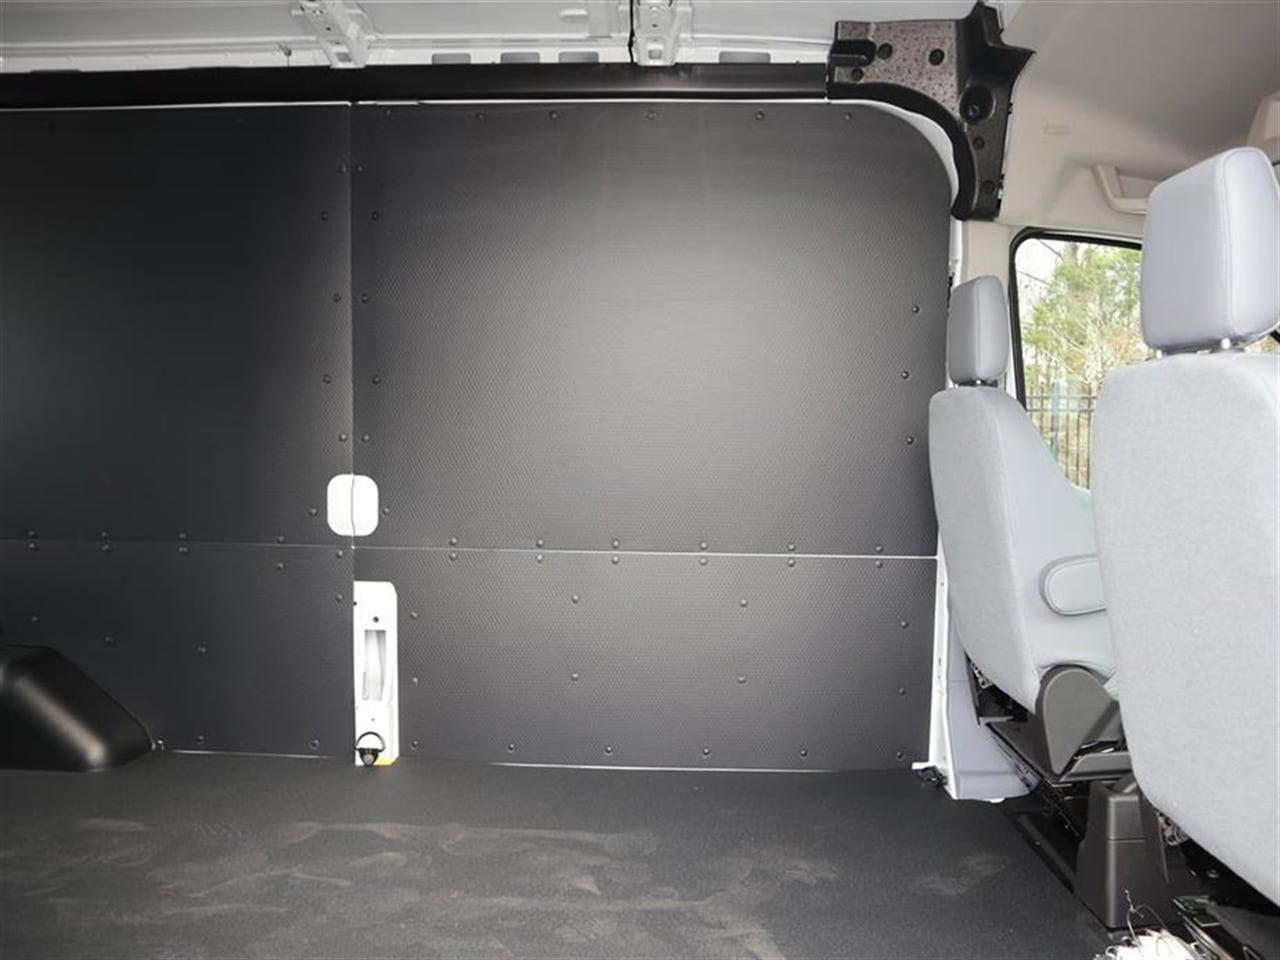 2019 Transit 250 Med Roof 4x2,  Empty Cargo Van #19T0462 - photo 1